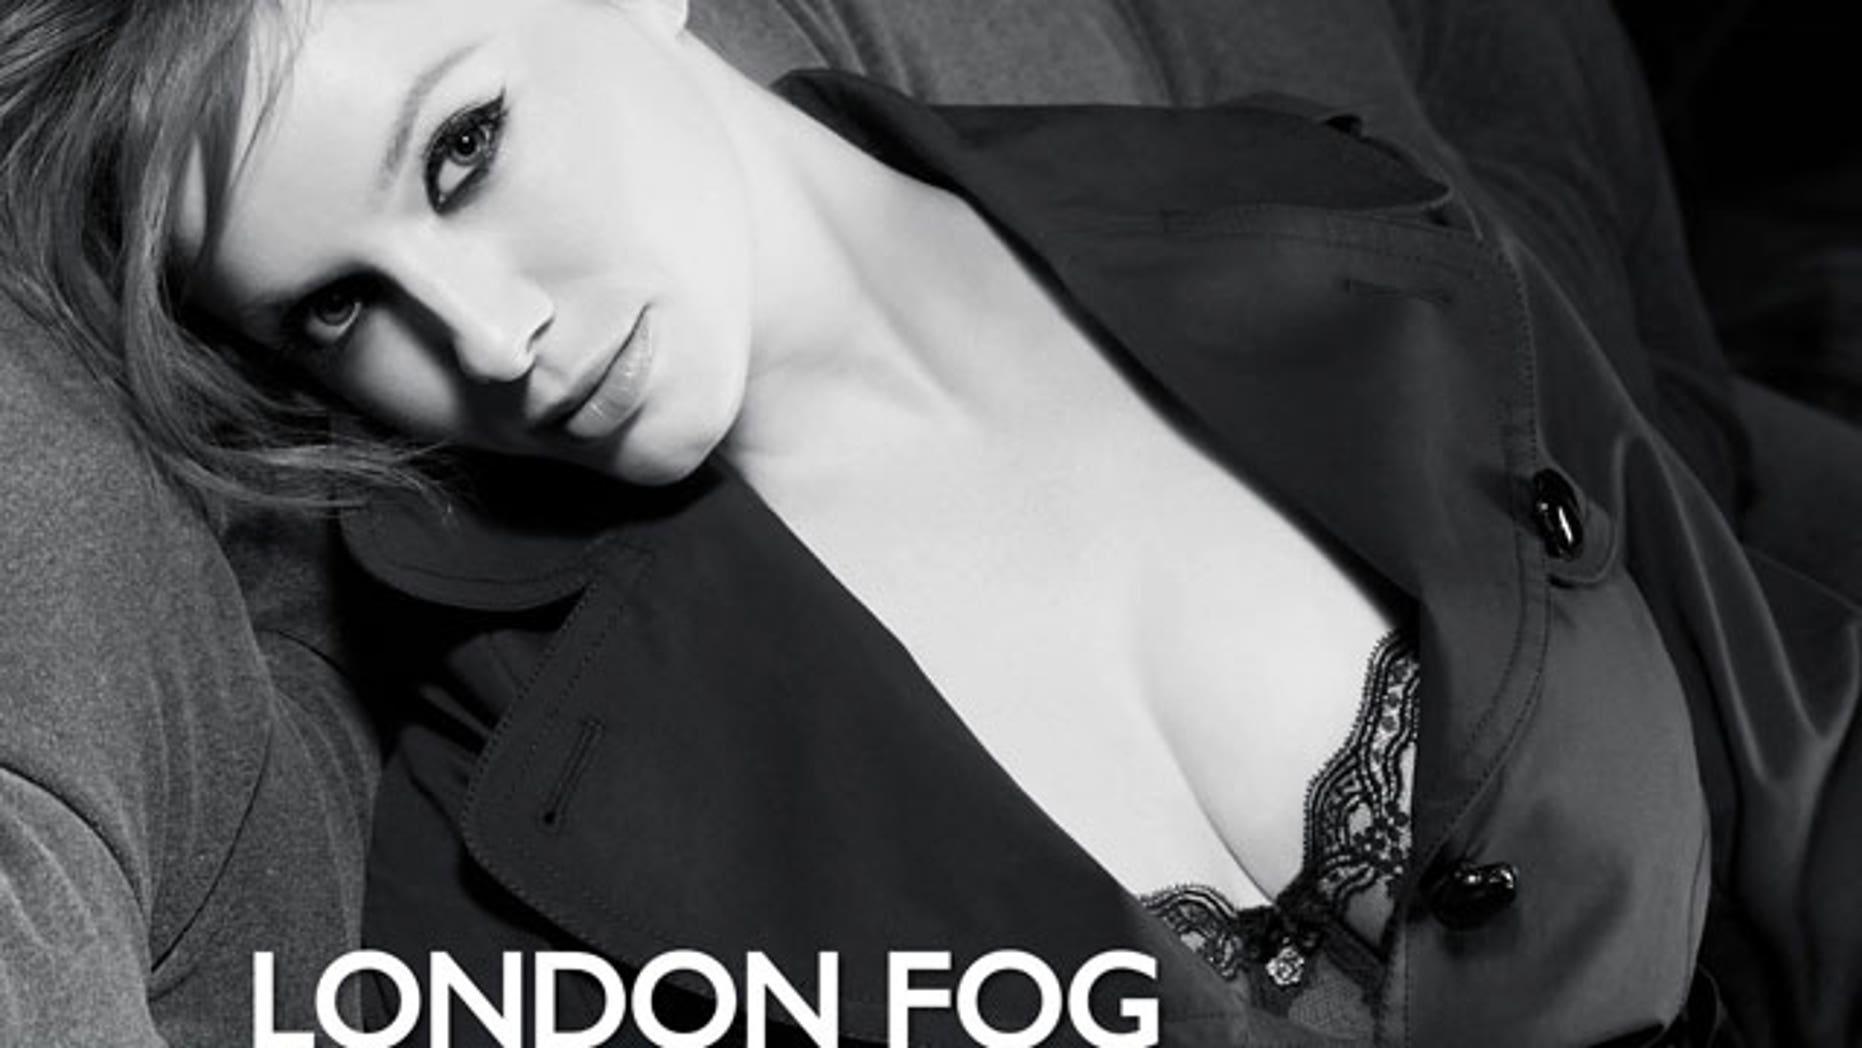 Christina Hendricks is the new celebrity spokeswoman for London Fog.